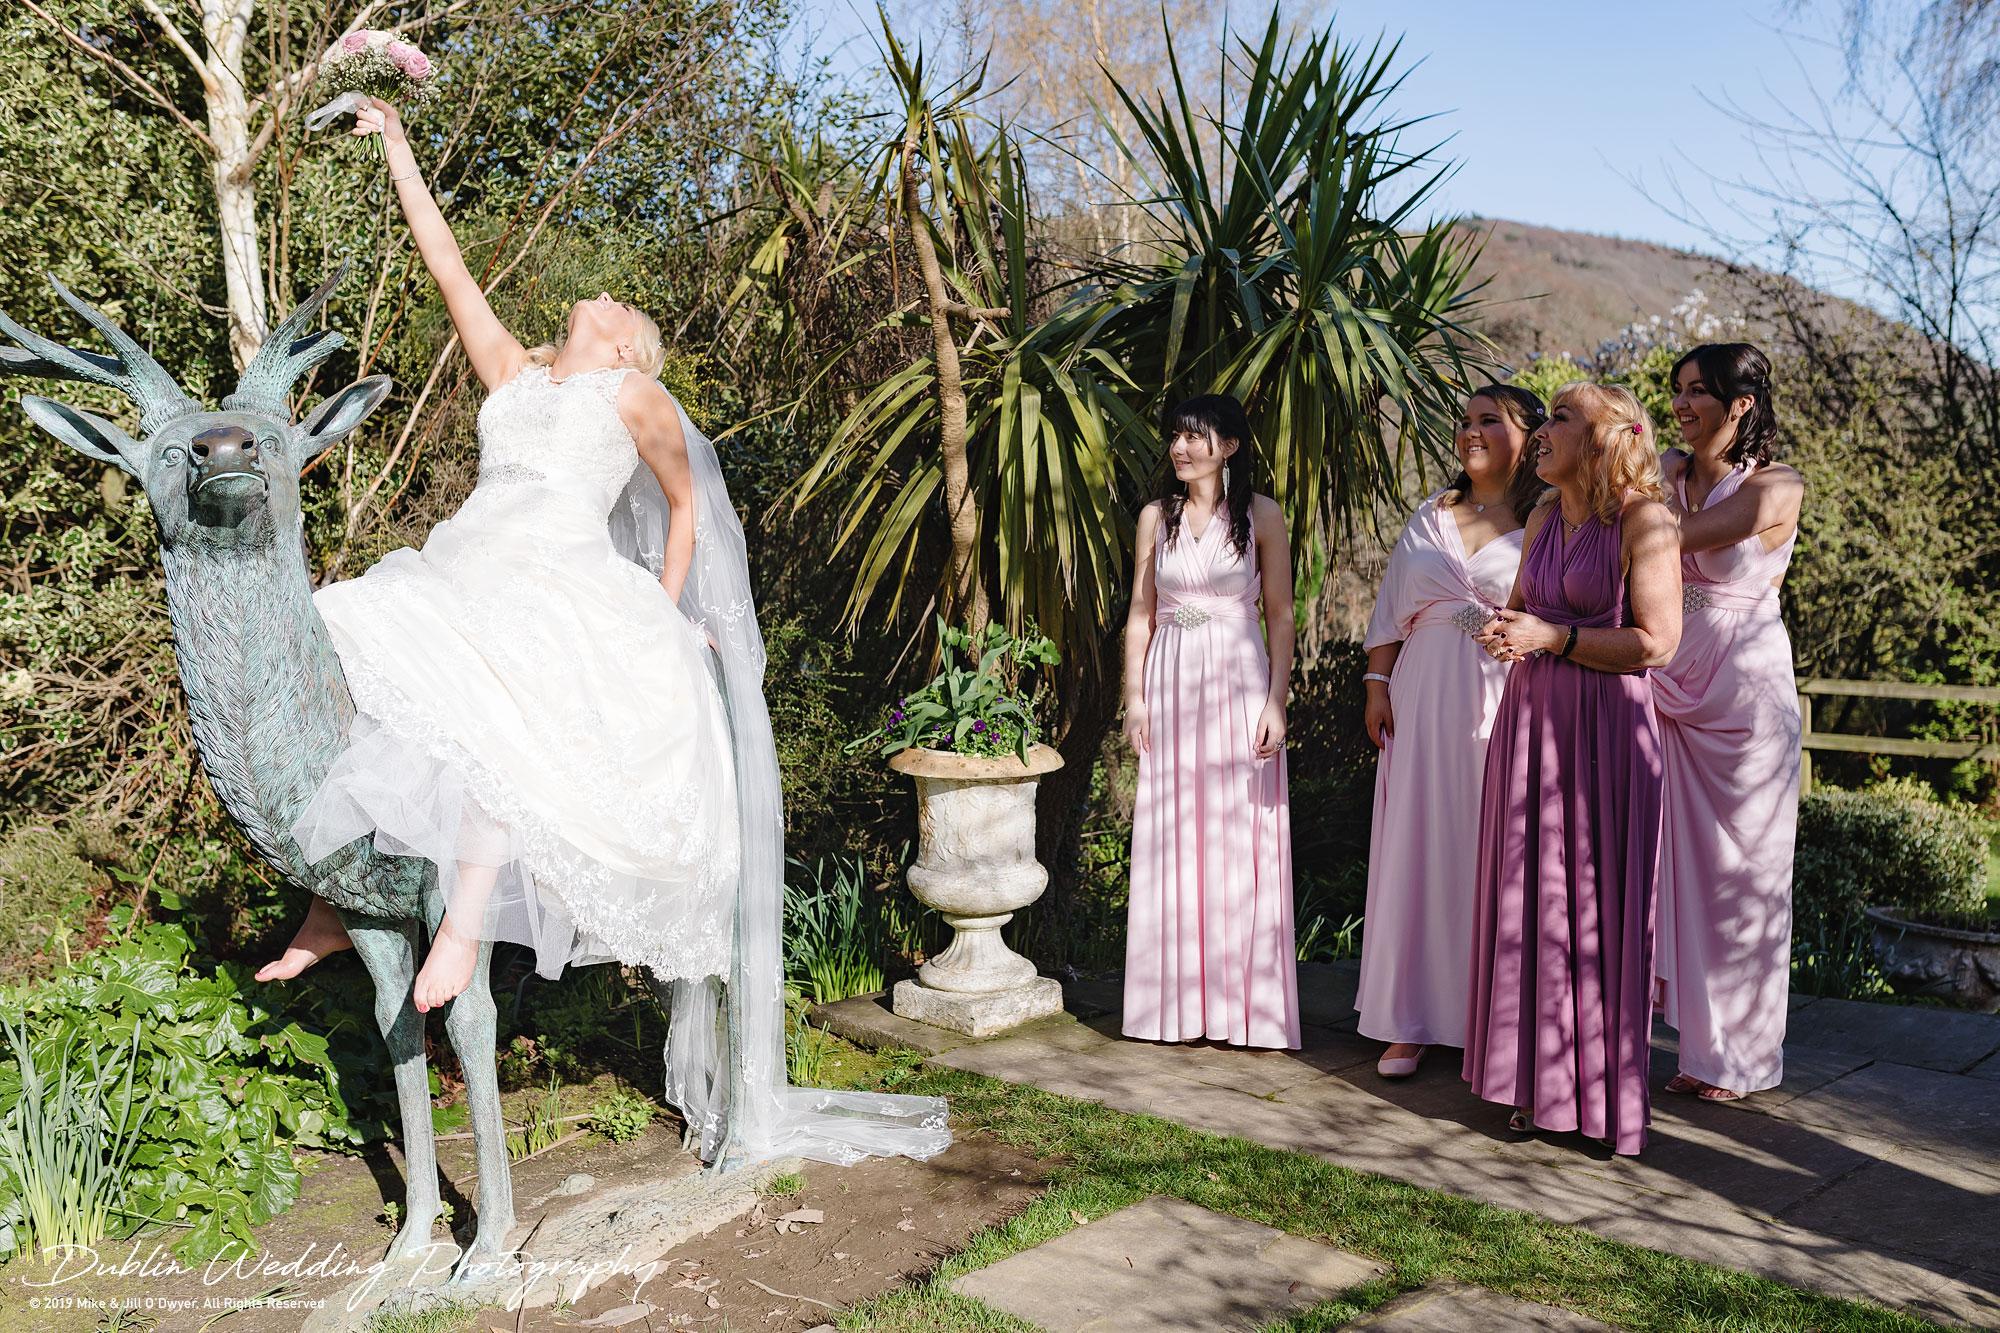 wedding-photographer-wicklow-glenview-hotel-KS045.jpg